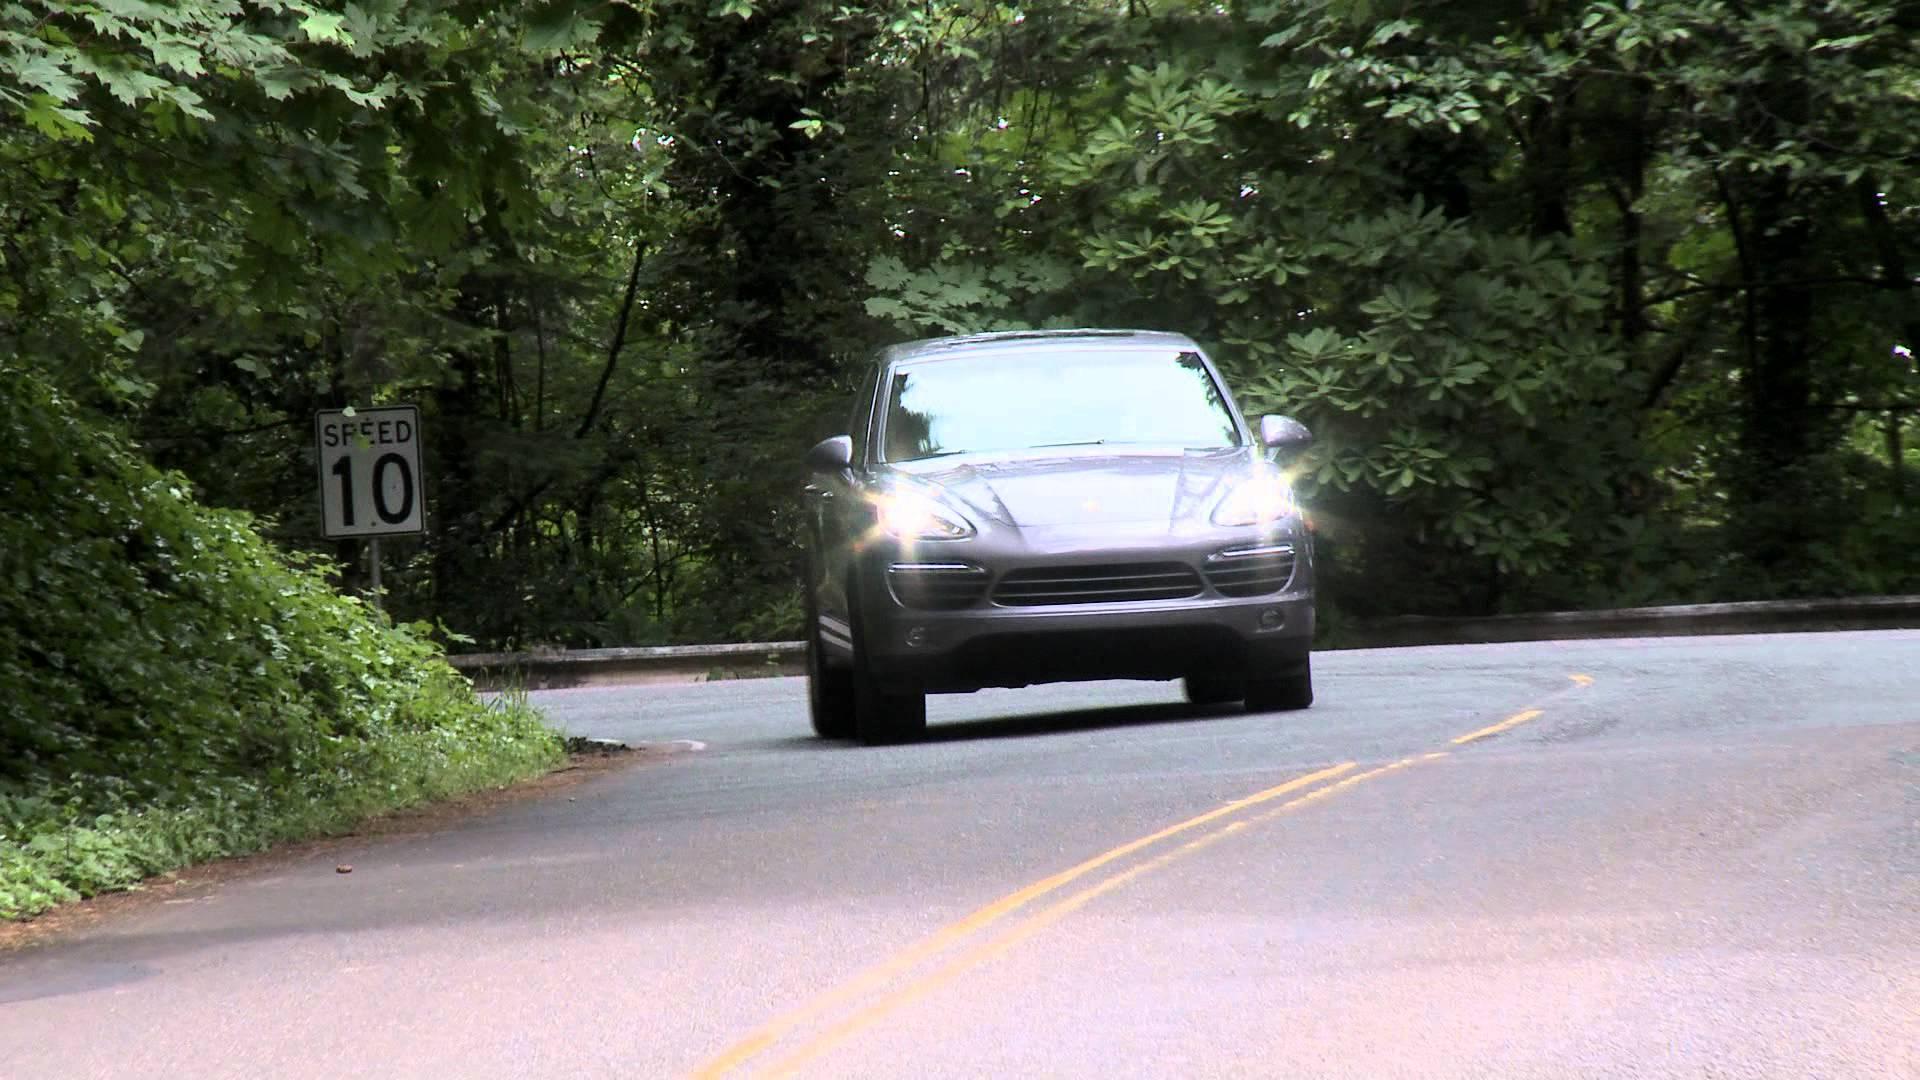 Preview Of The Porsche Cayenne Hybridnbsp